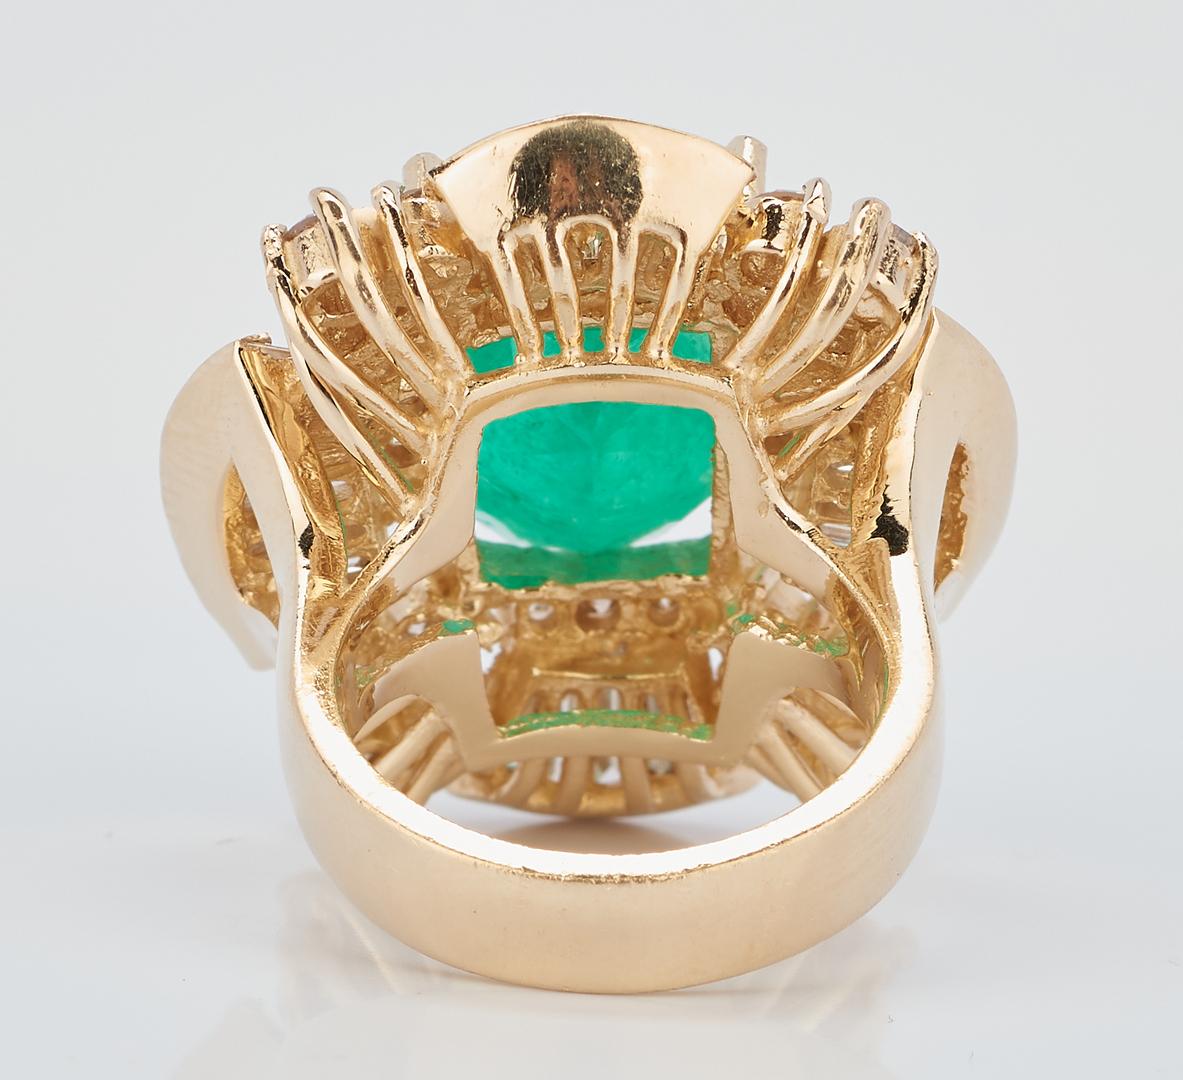 Lot 44: 11 Carat Emerald and Diamond Dinner Ring